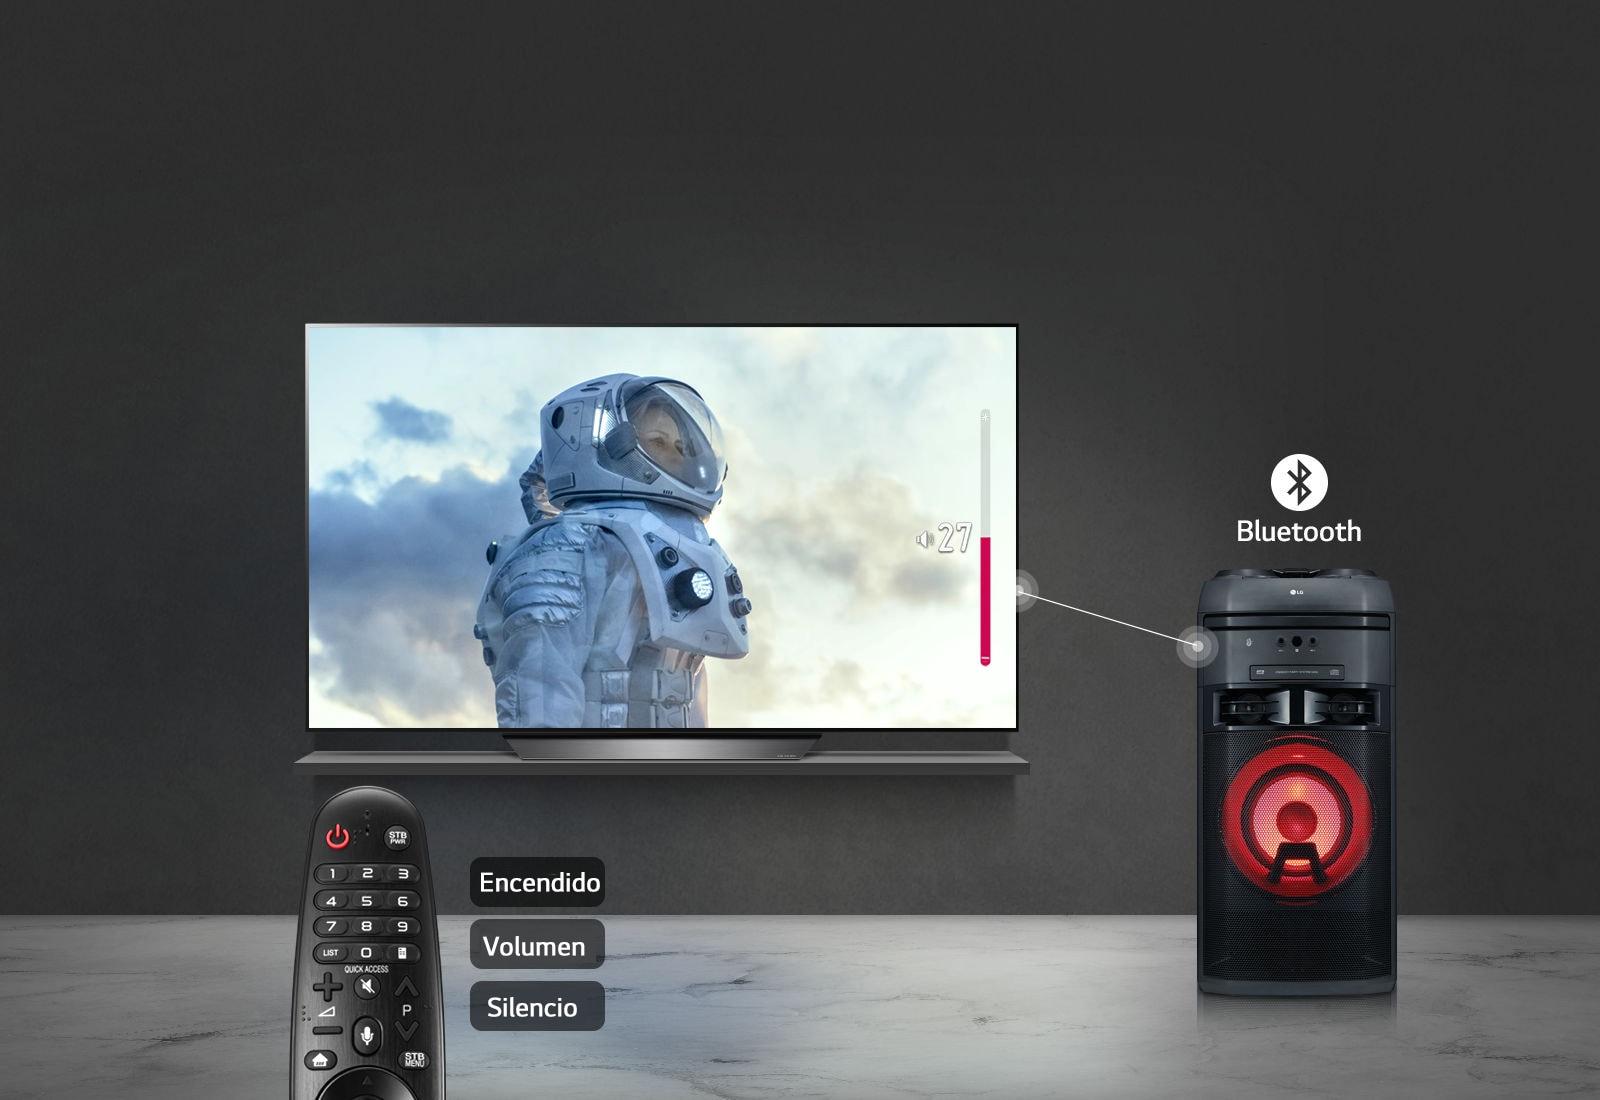 08_OK55_TV_Sound_Sync_Desktop